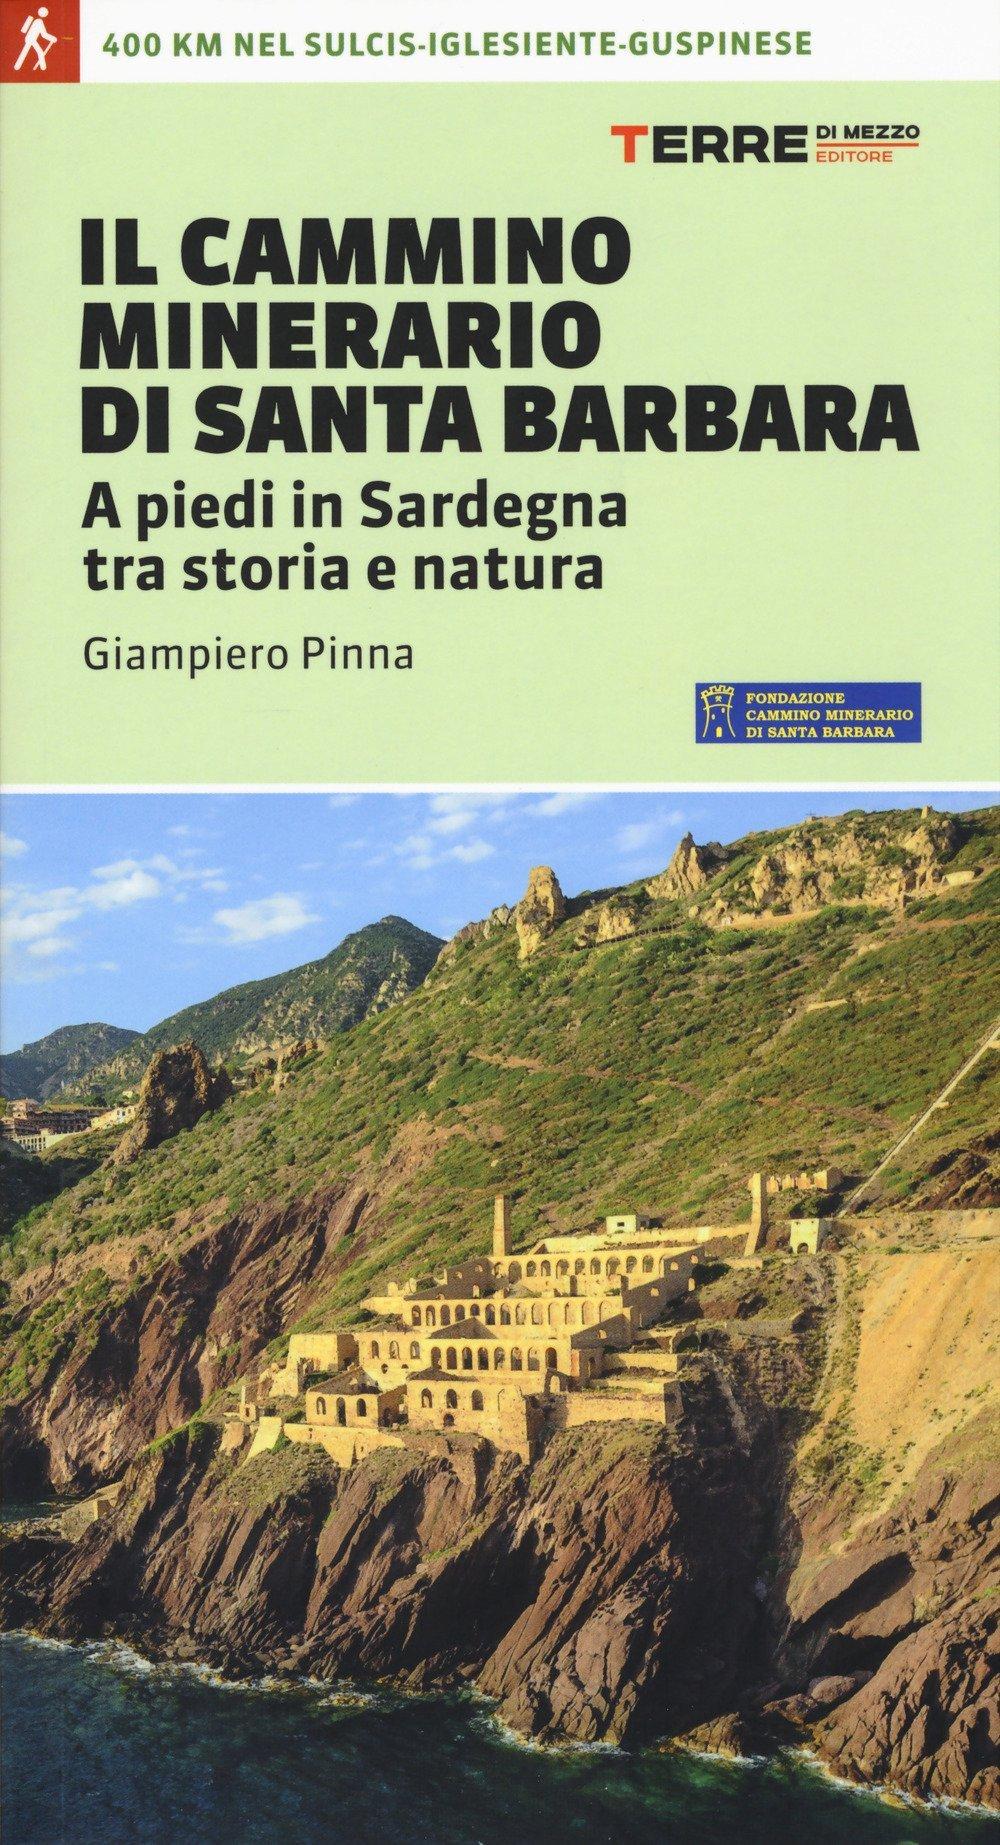 Il Cammino Minerario di Santa Barbara 9788861892514  Terre di Mezzo   Meerdaagse wandelroutes, Wandelgidsen Sardinië